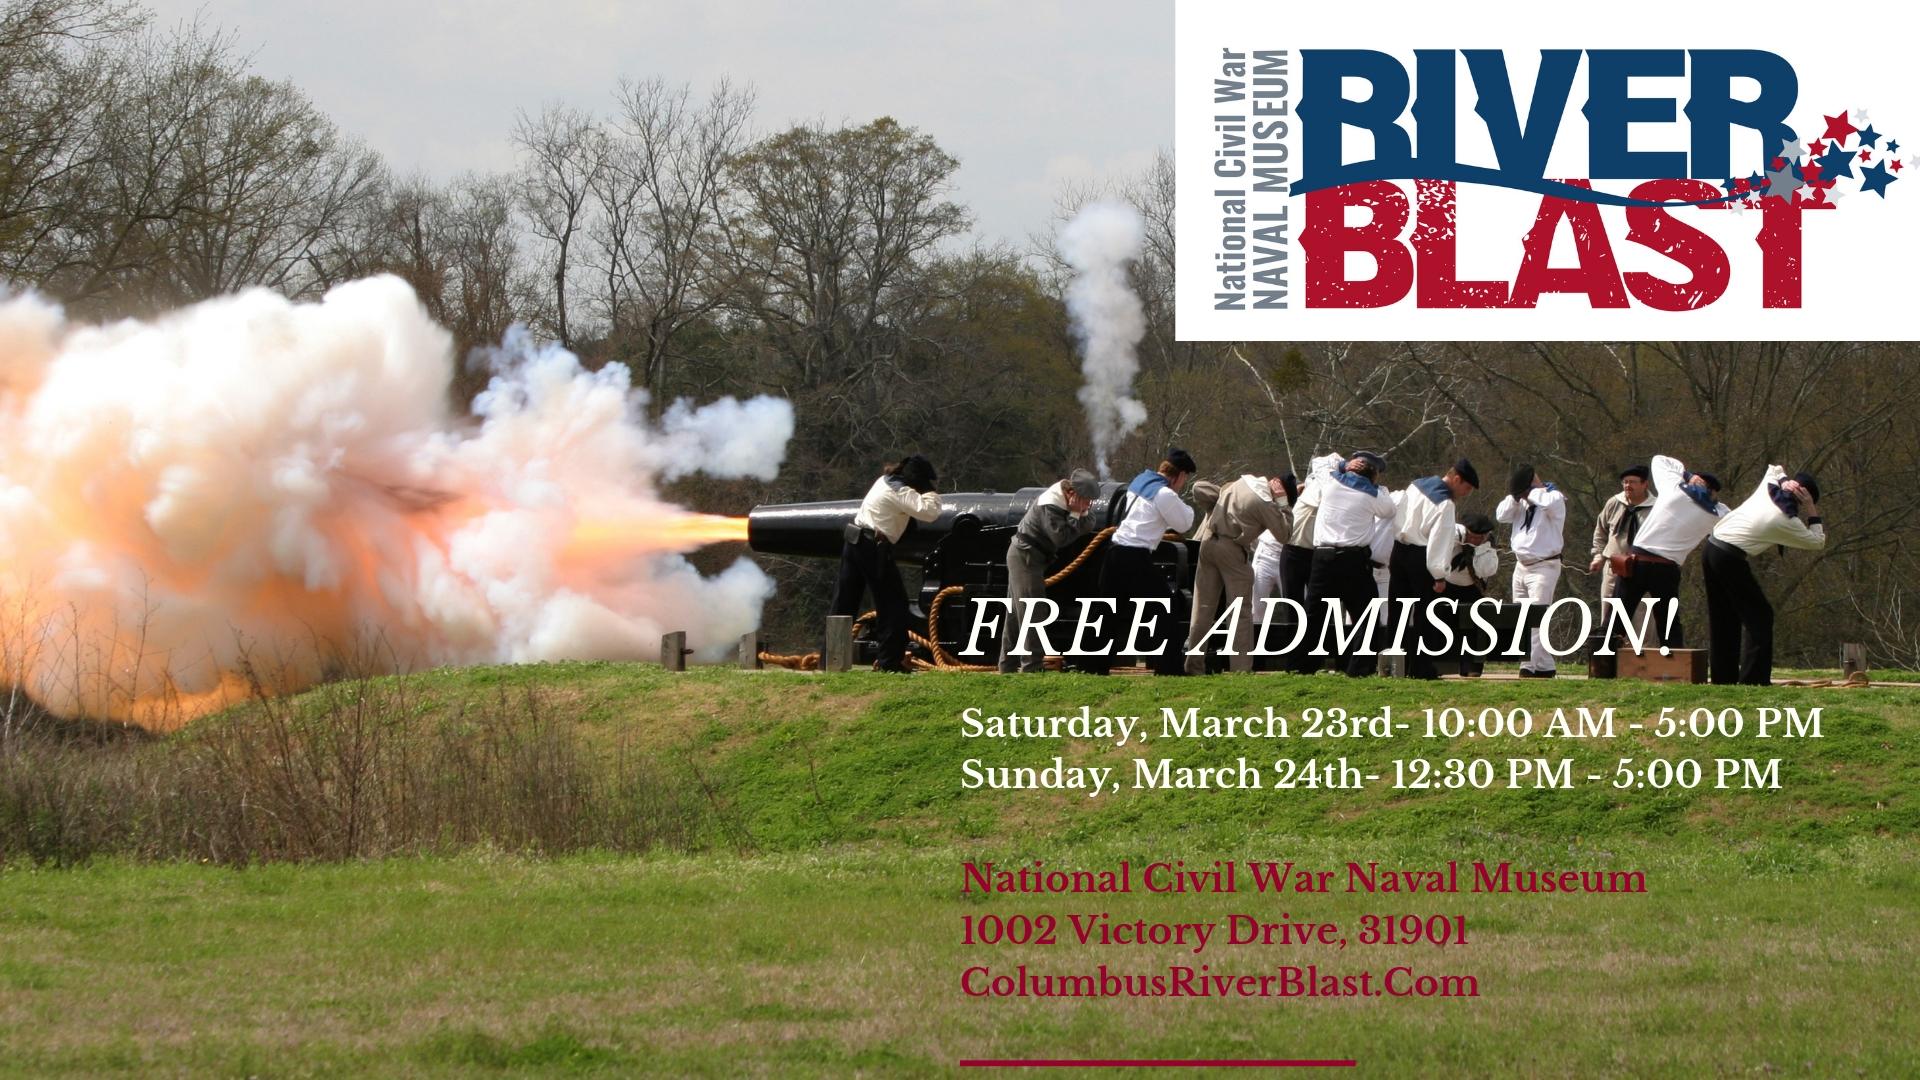 RiverBlast Festival!